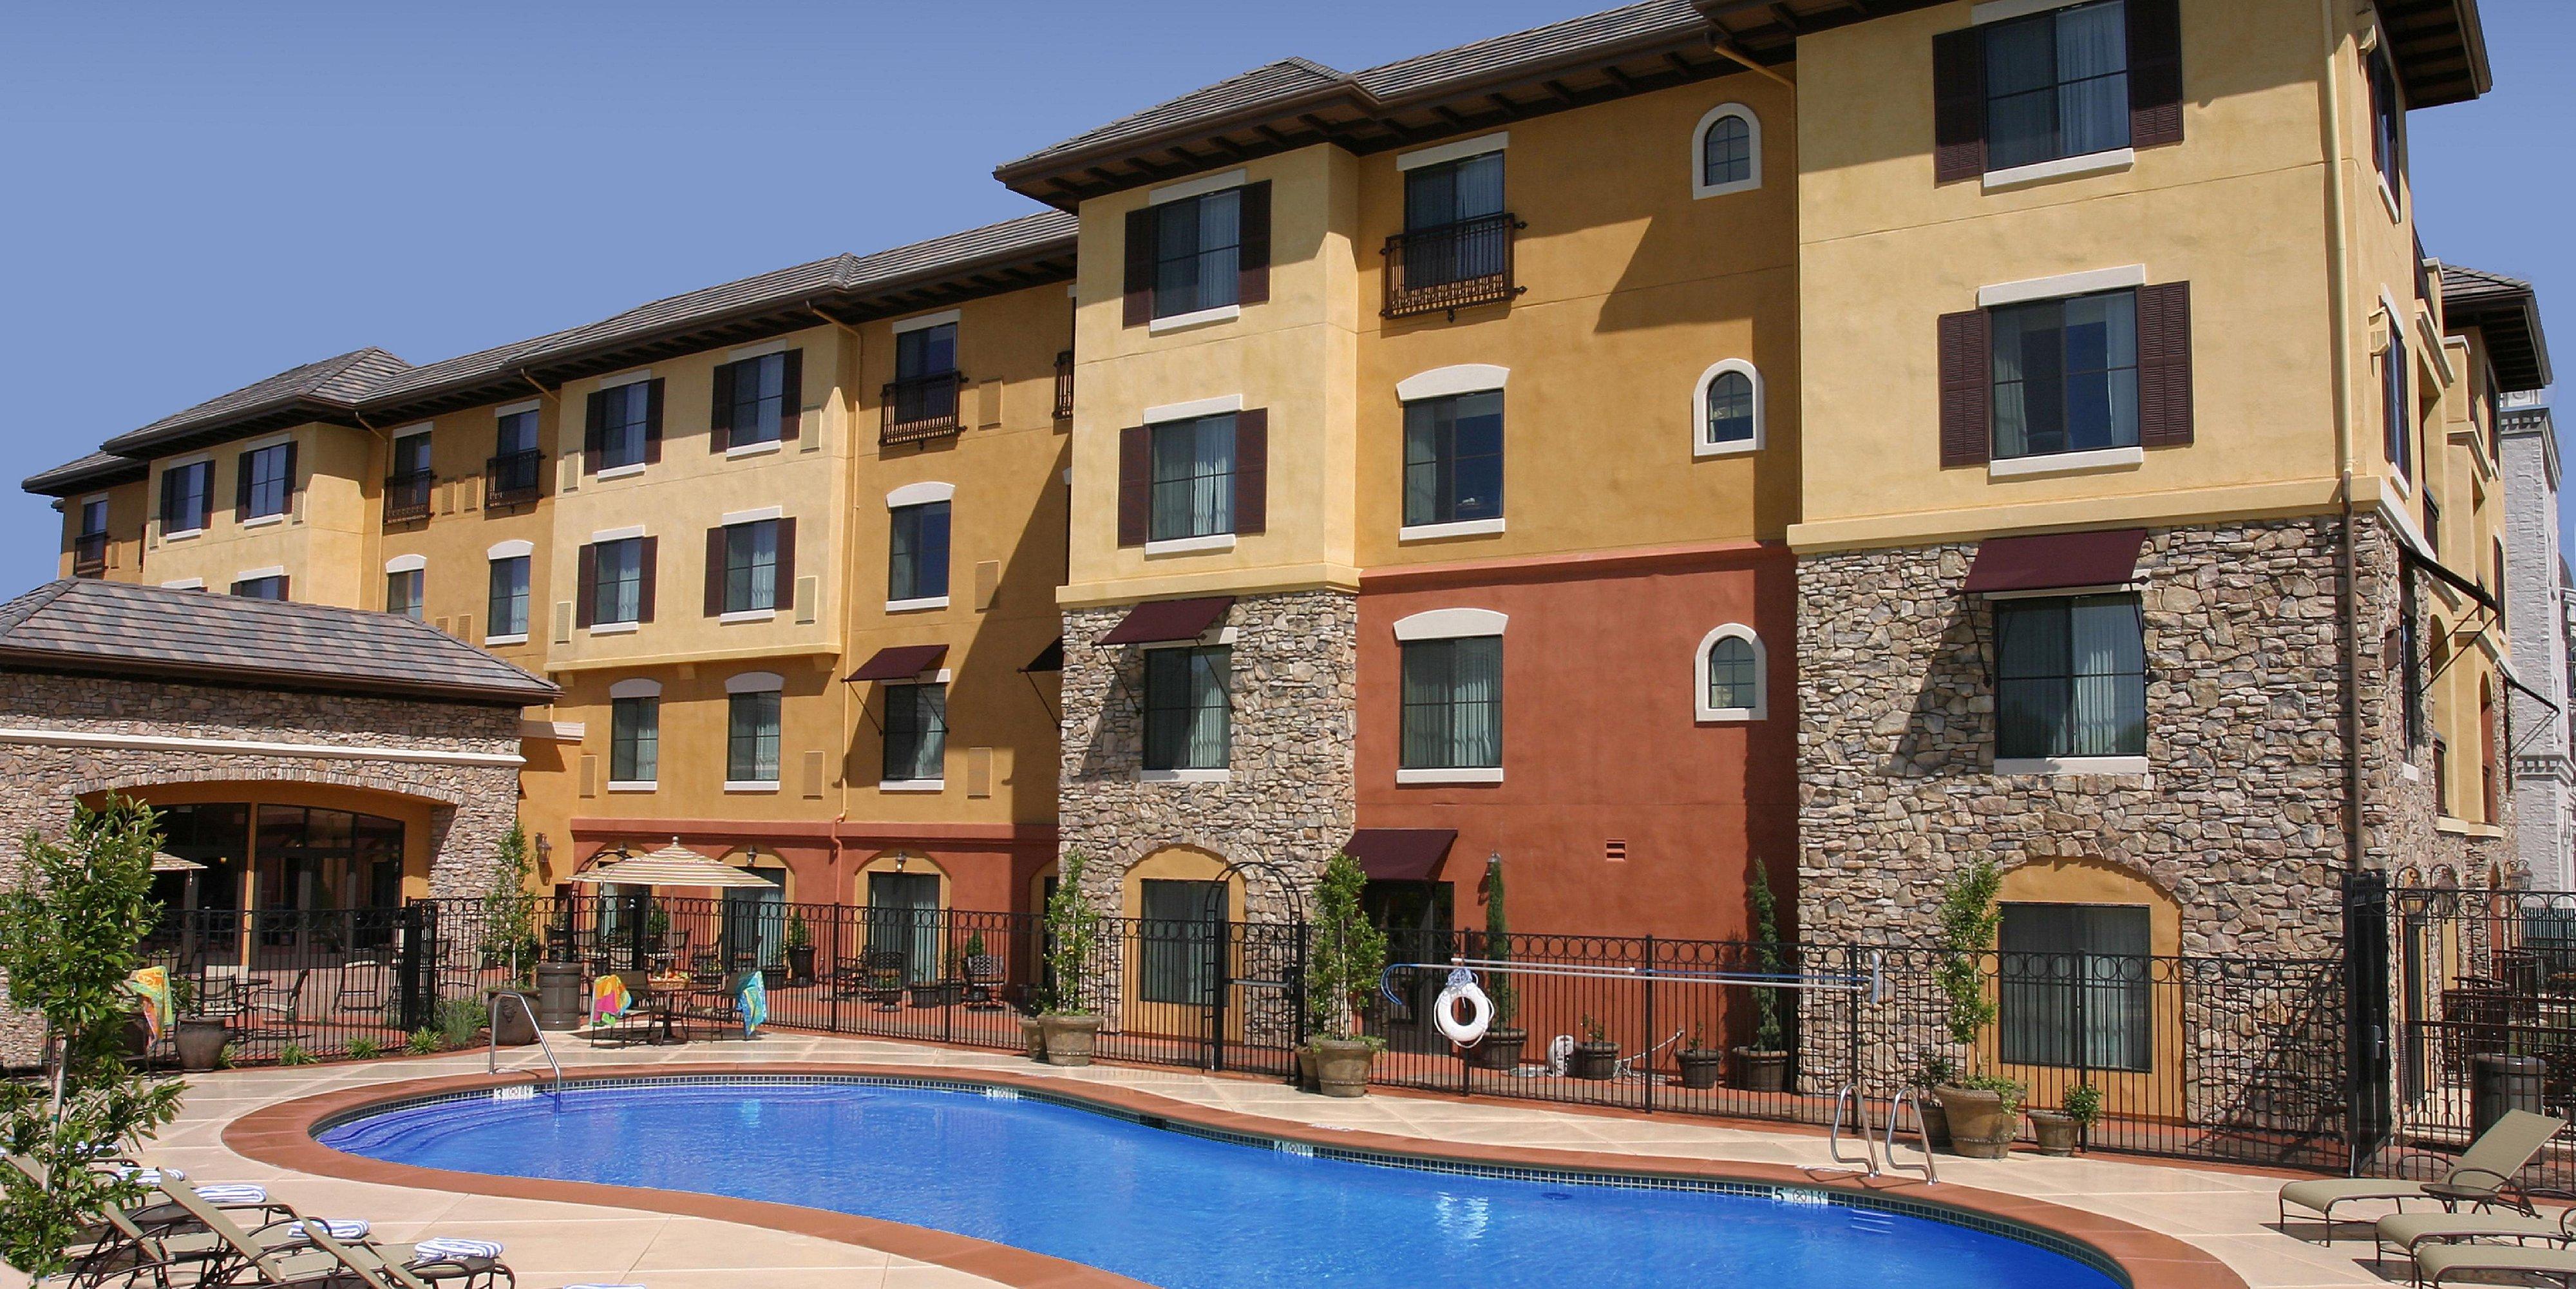 Holiday Inn Express And Suites El Dorado Hills